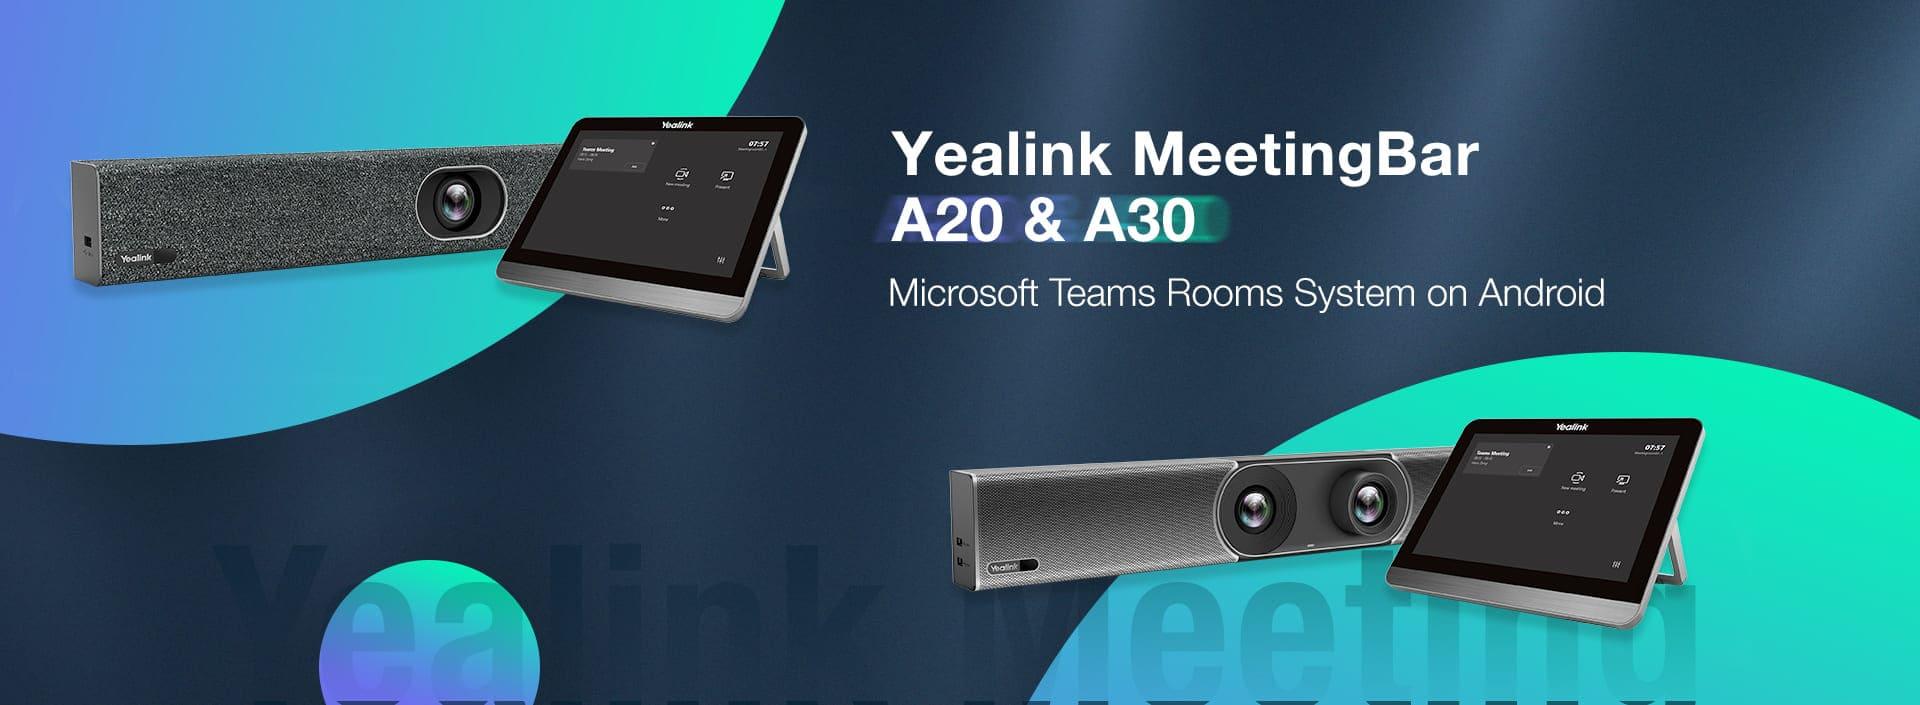 Yealink MeetingBar A20-A30